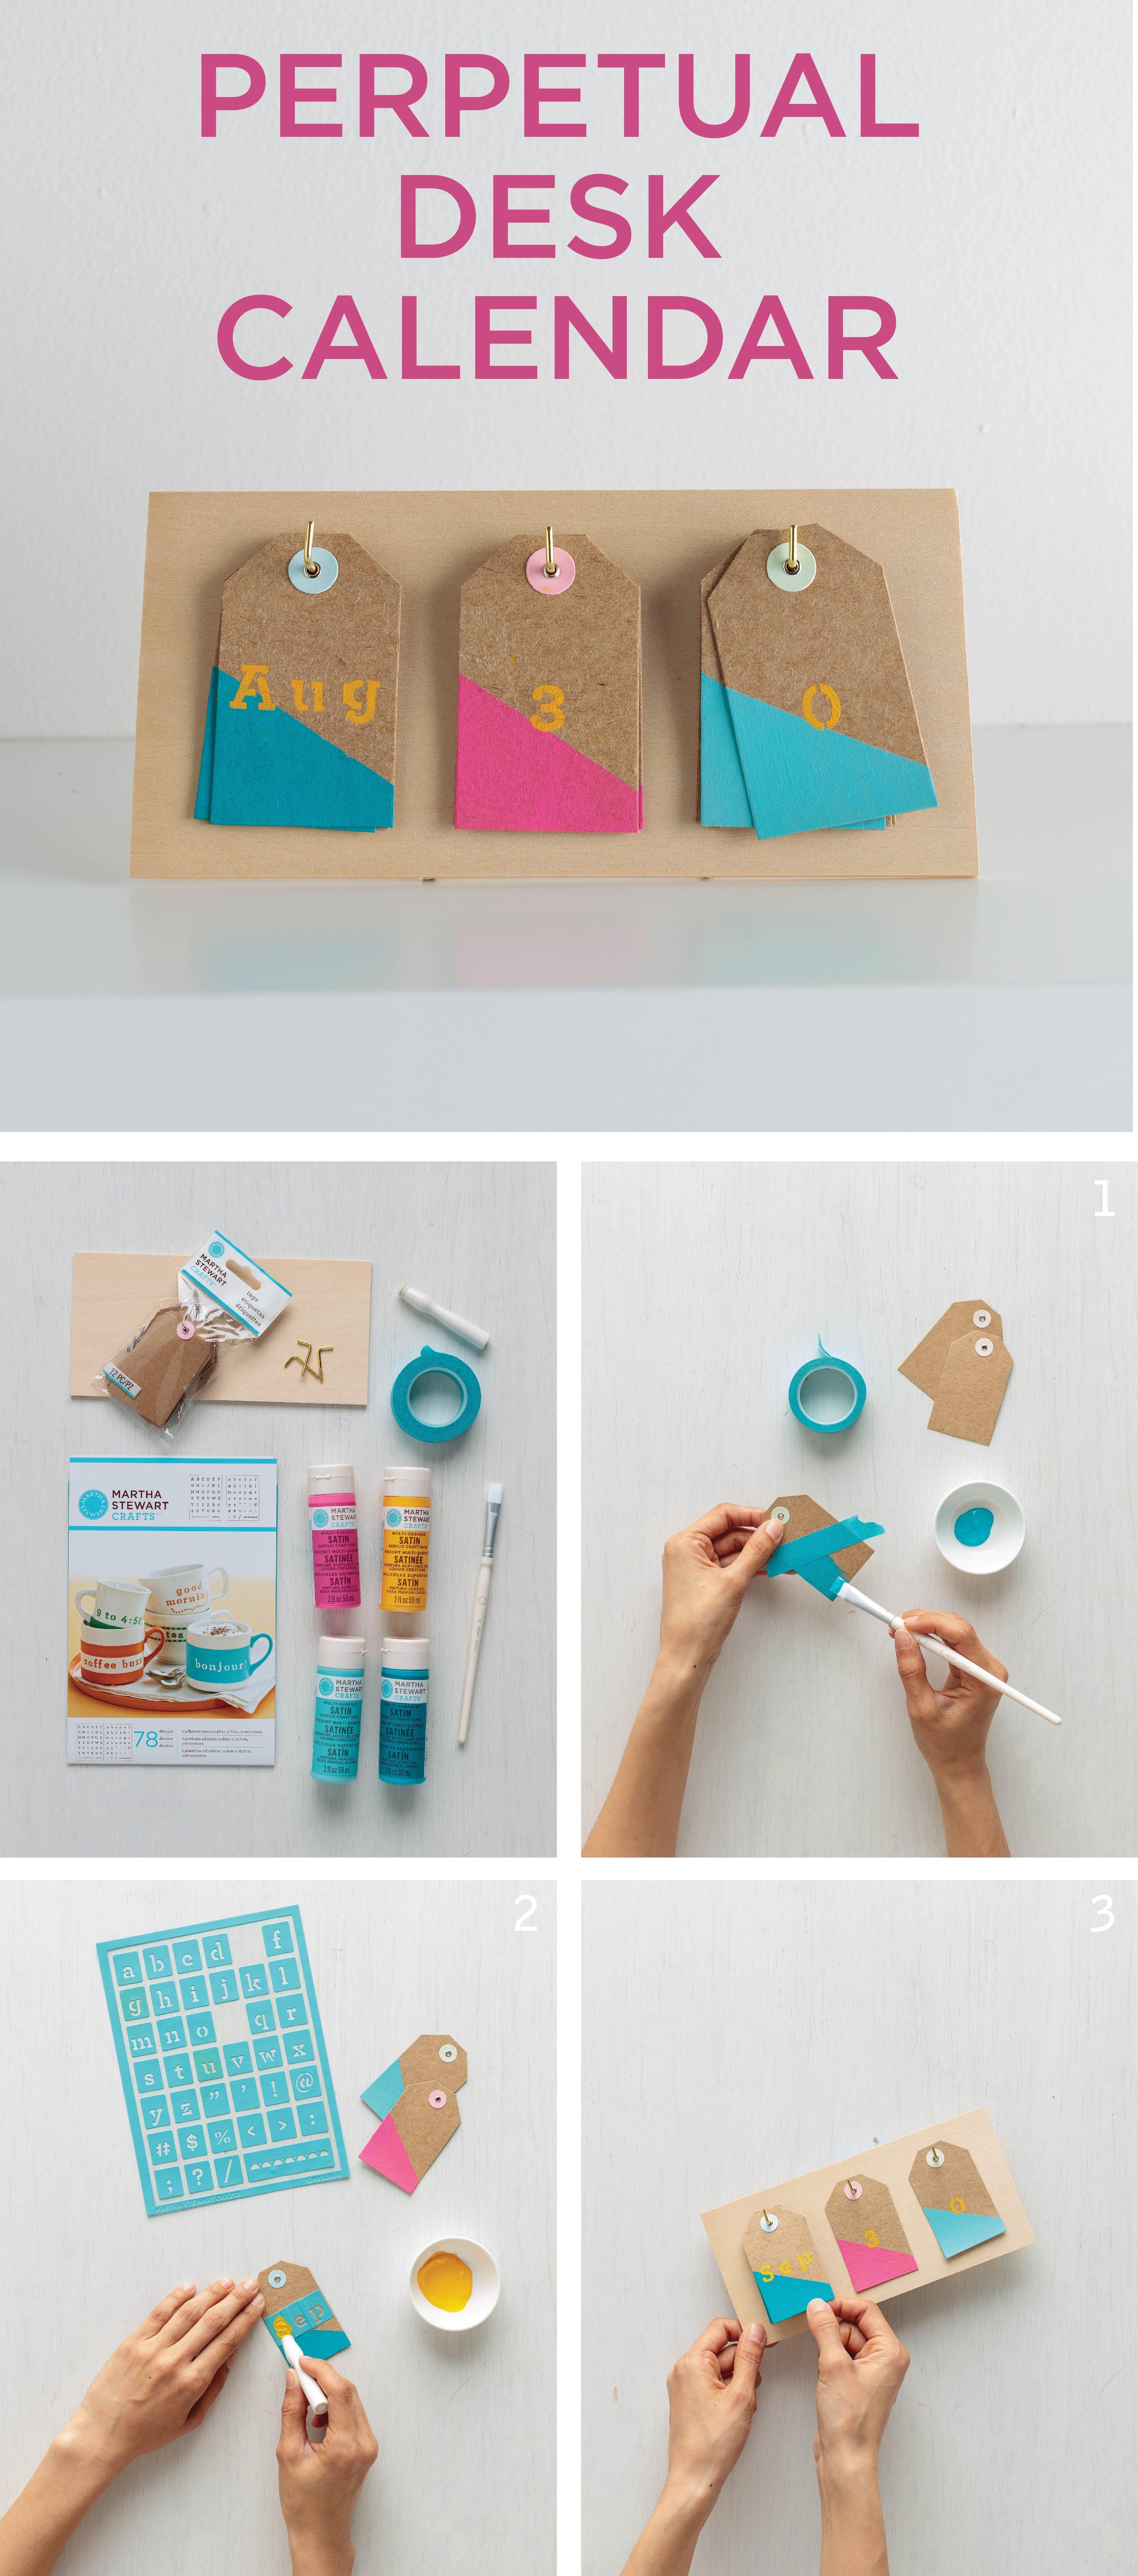 Desk Calendar Design Your Own : Perpetual desk calendar crafts pinterest diy